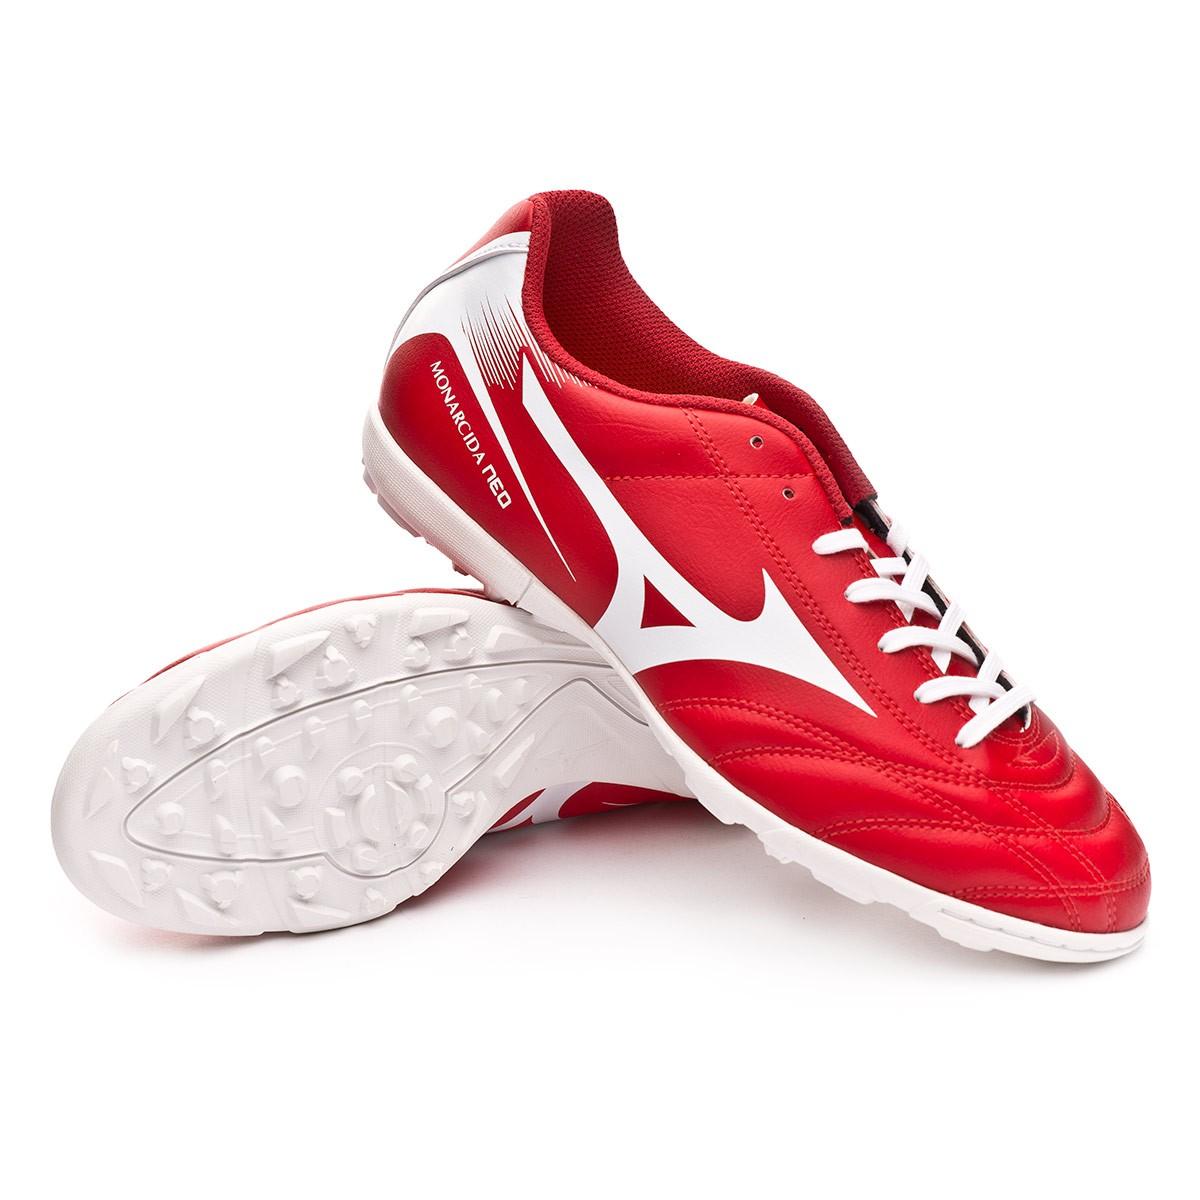 mens mizuno running shoes size 9.5 en espa�ol facebook messenger